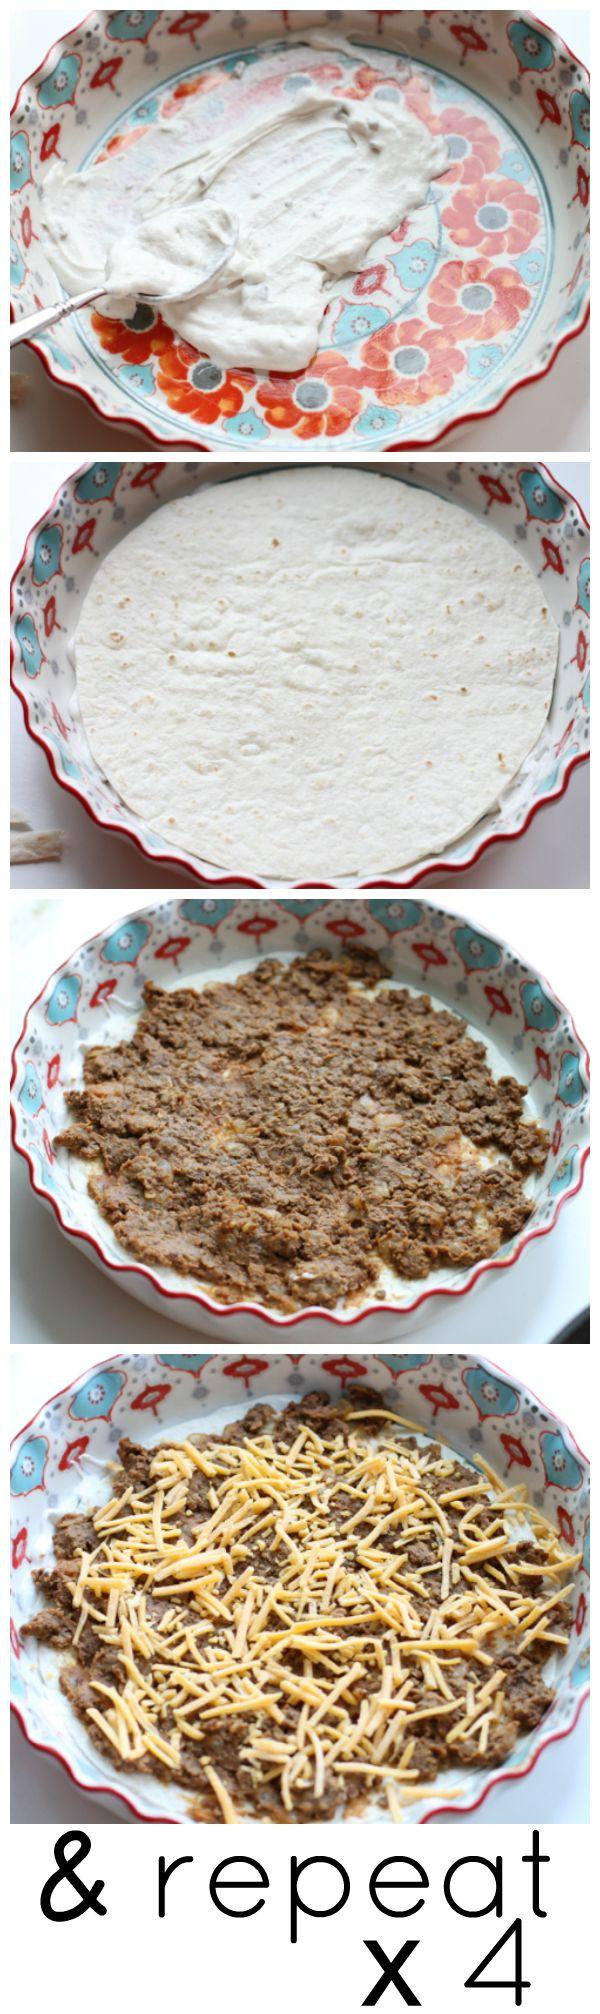 Layering the Burrito Pie